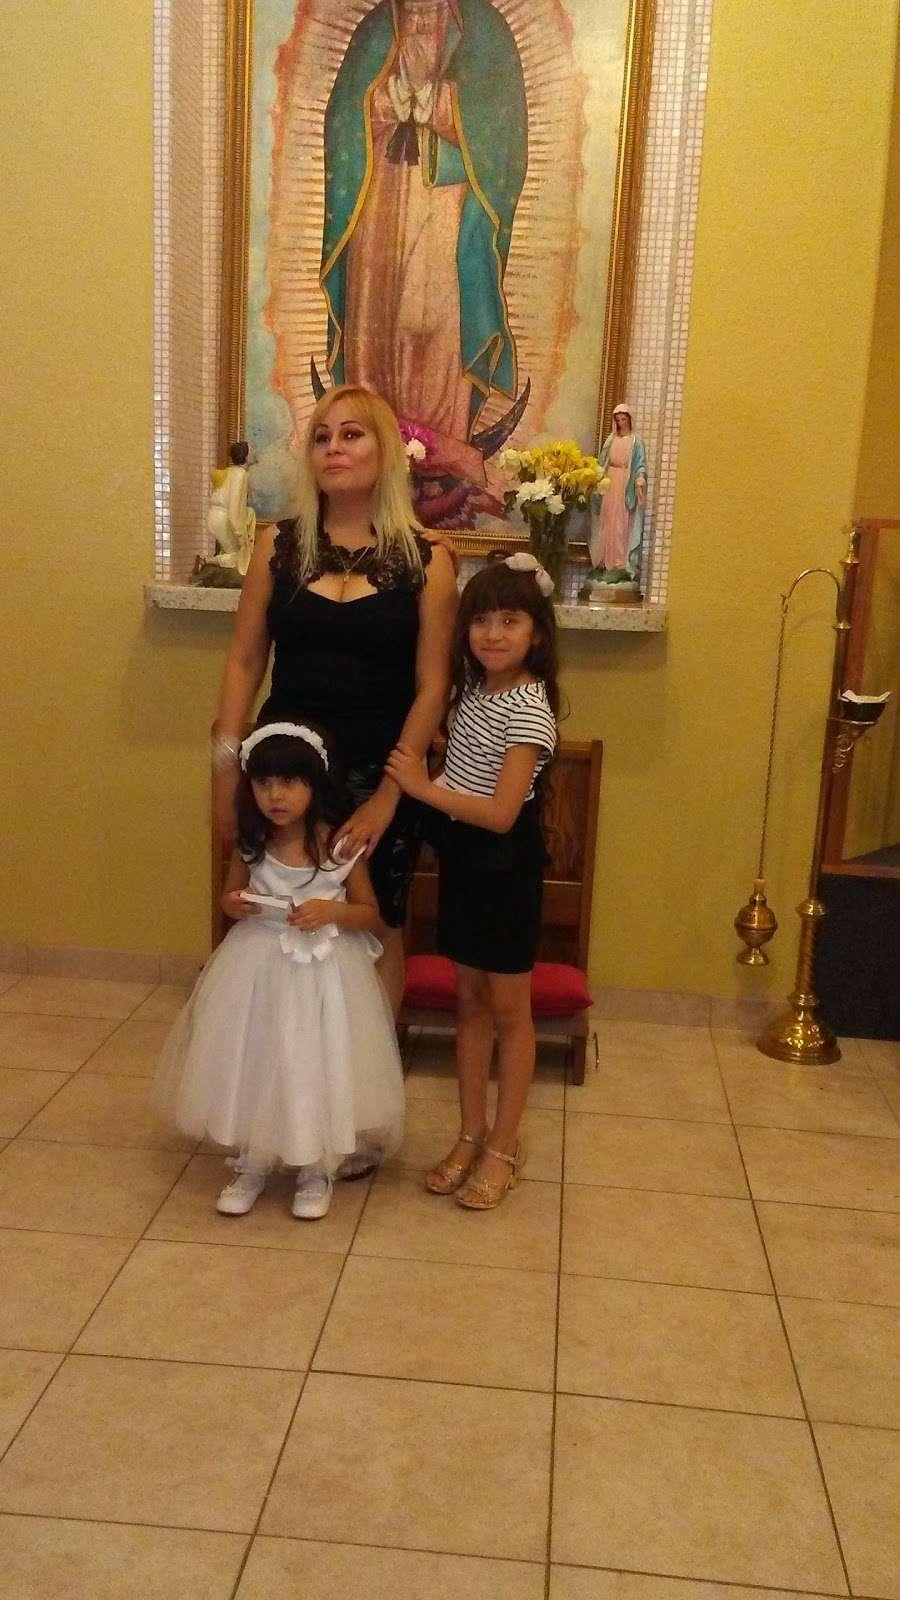 Saint Williams Catholic Church - church    Photo 7 of 9   Address: 11025 W 3rd St, Cashion, AZ 85329, USA   Phone: (623) 936-6115